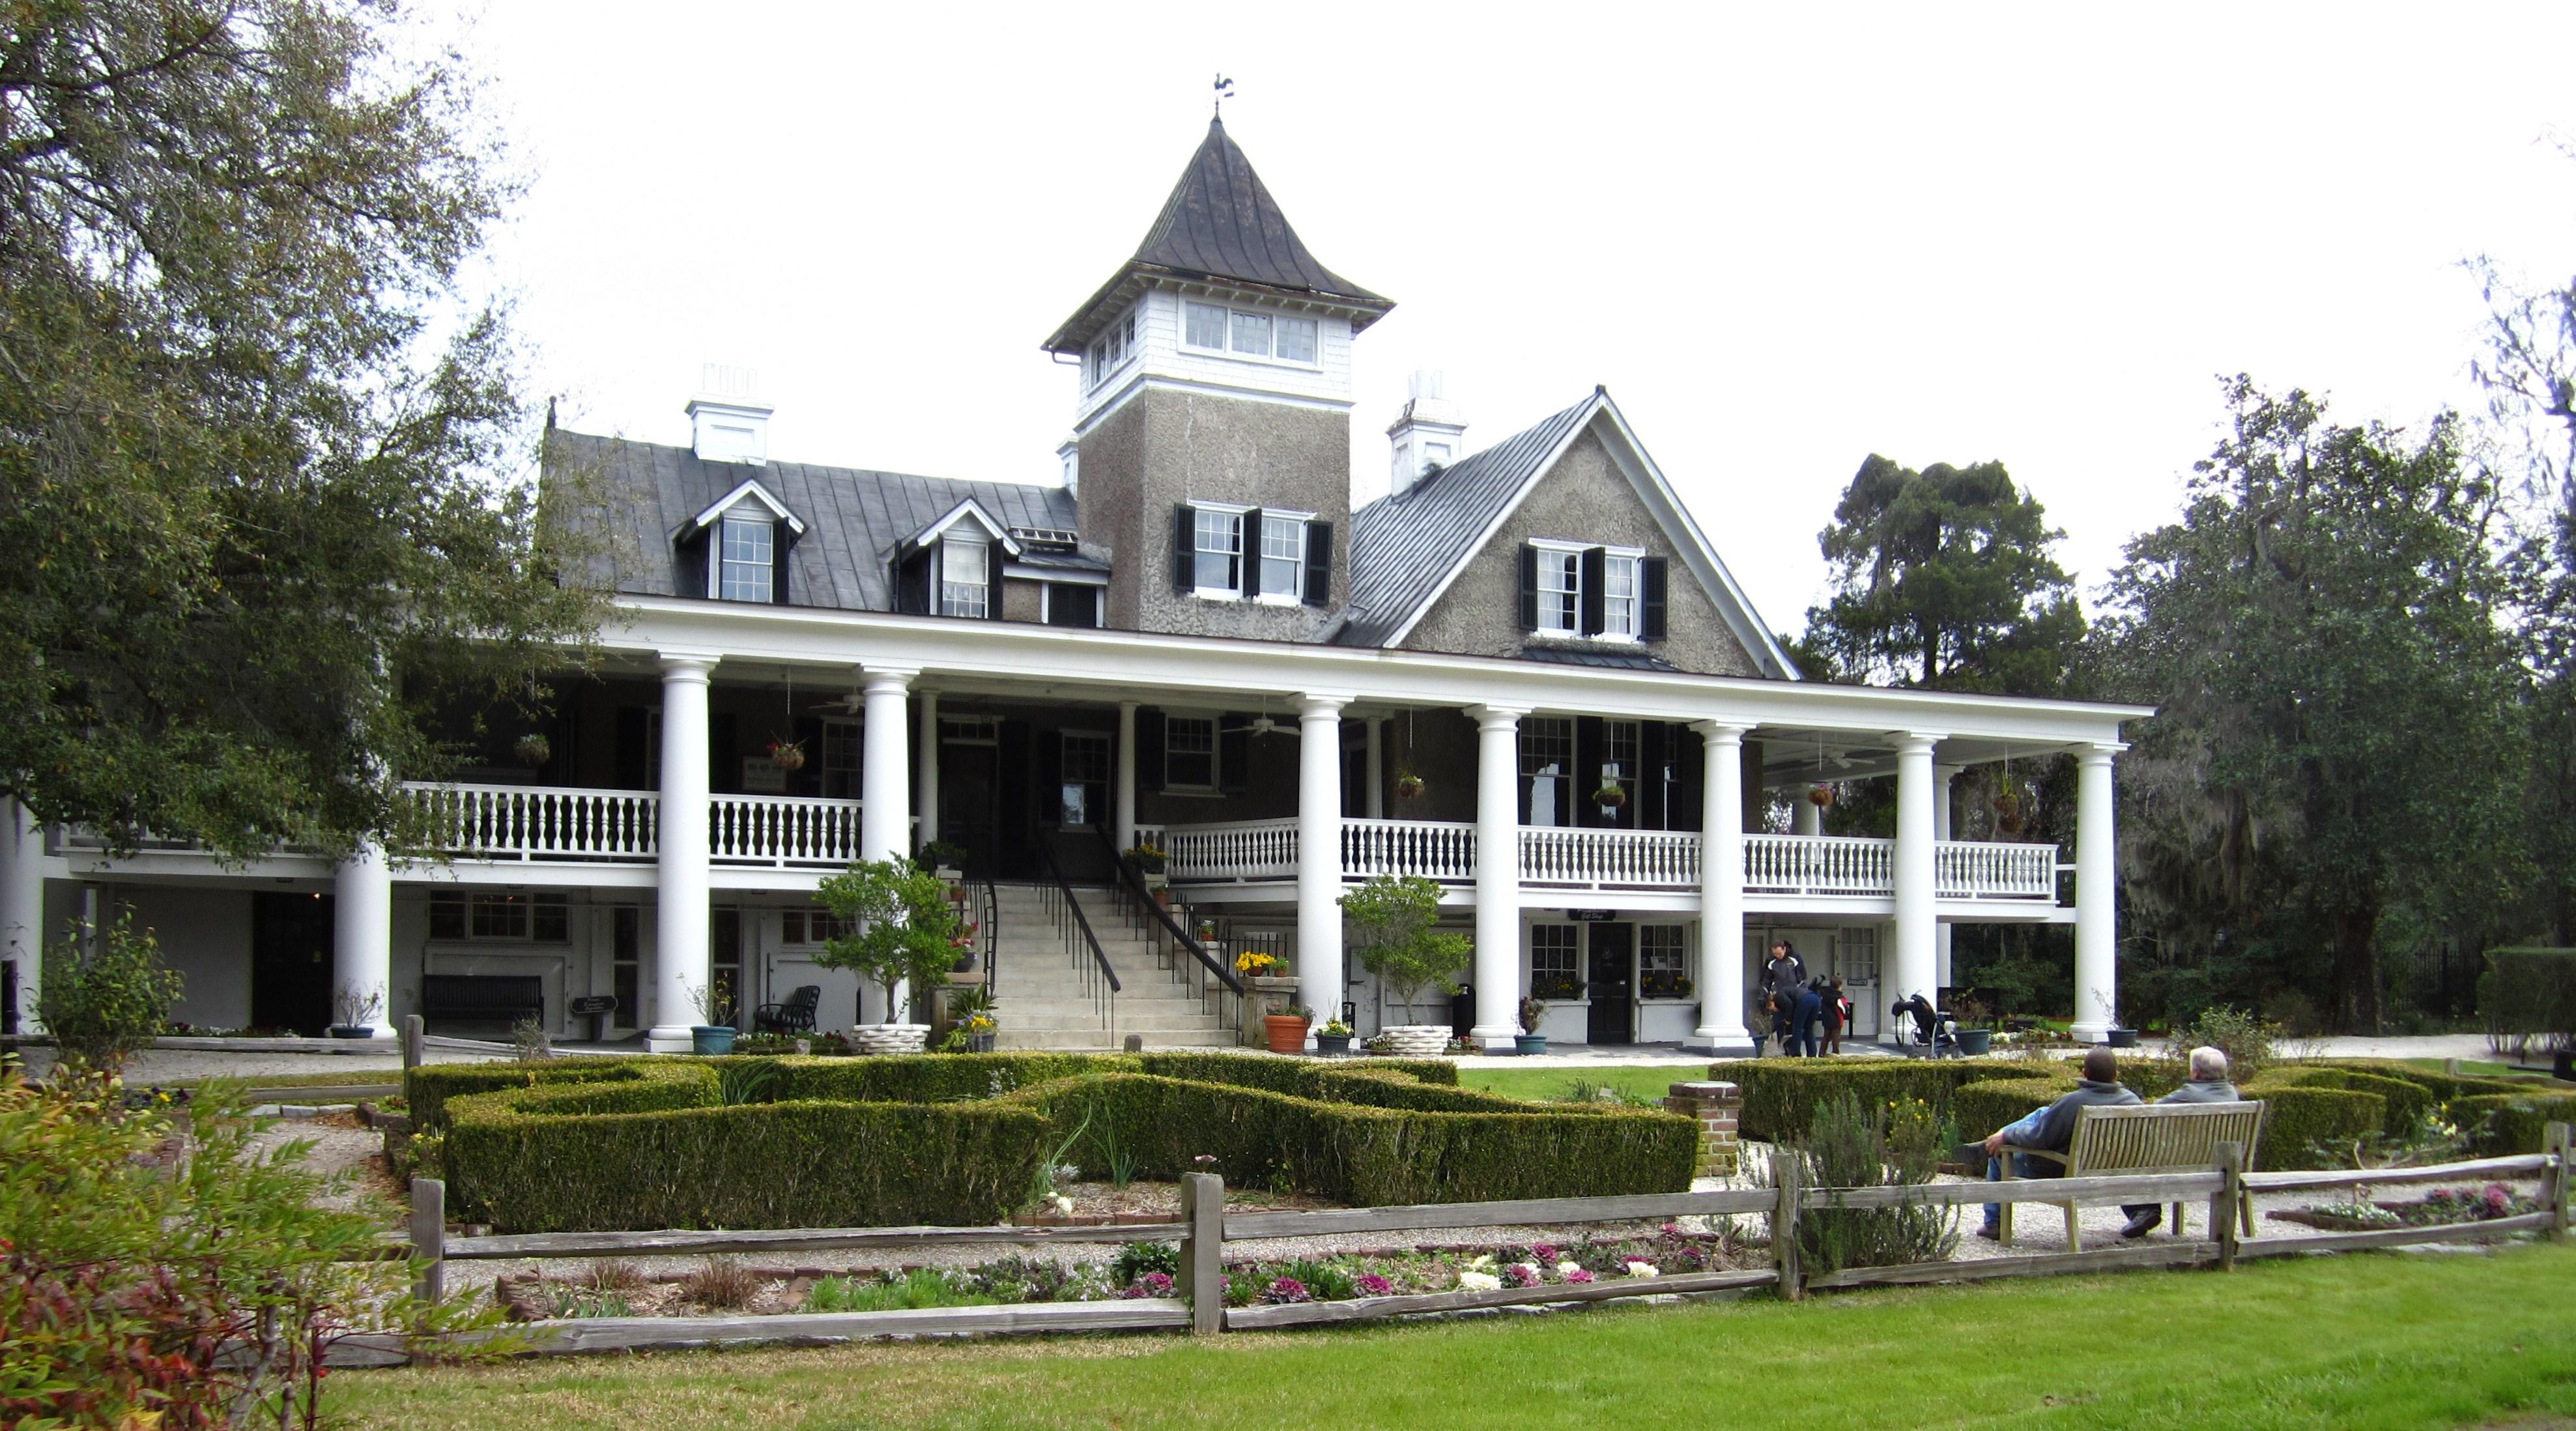 belgard pavers paver stones retaining walls hardscapes magnolia gardens nursing home. Interior Design Ideas. Home Design Ideas